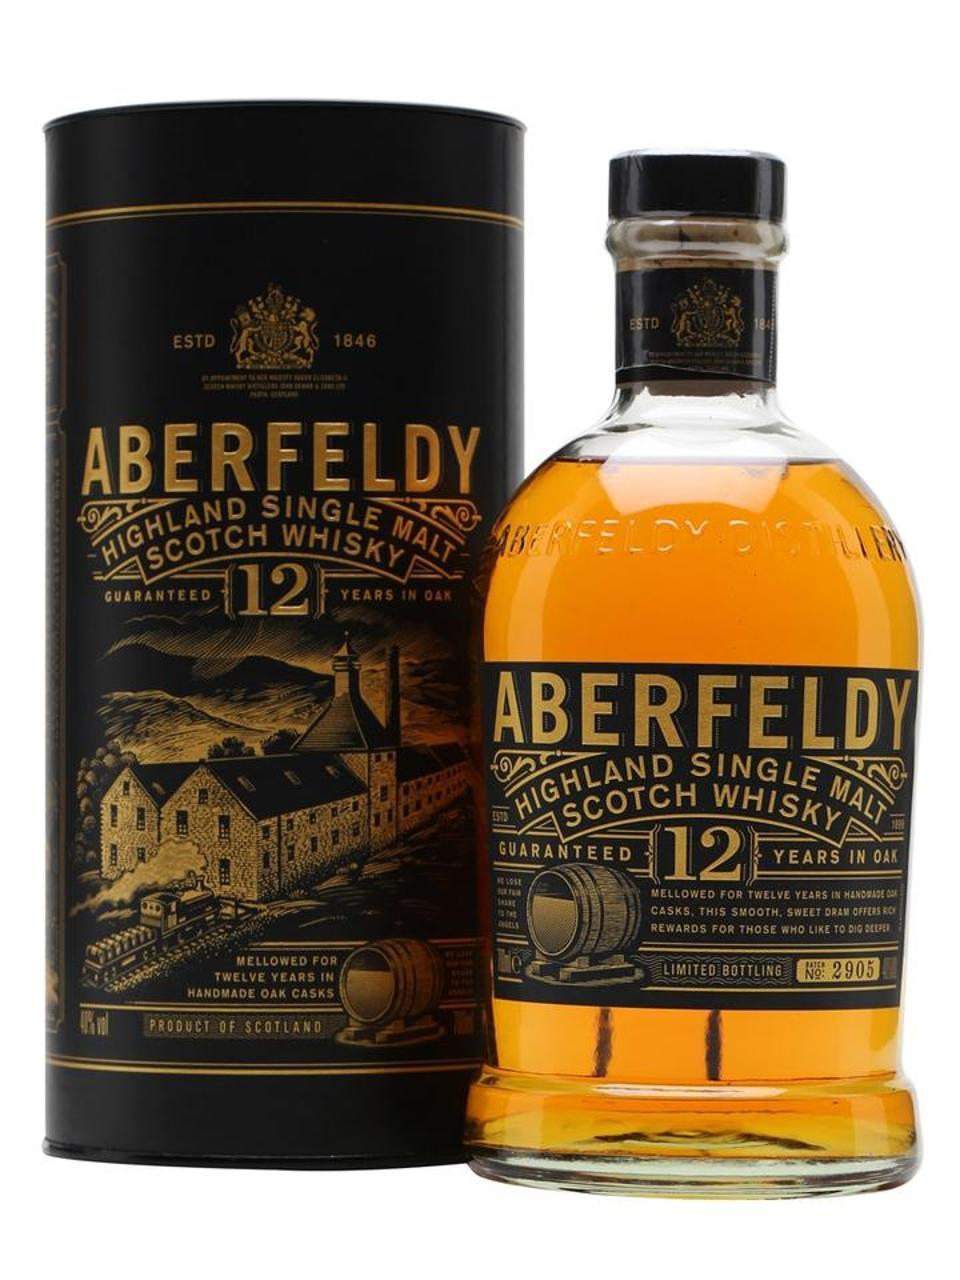 Aberfeldy 12 YO Single Malt Scotch Whisky